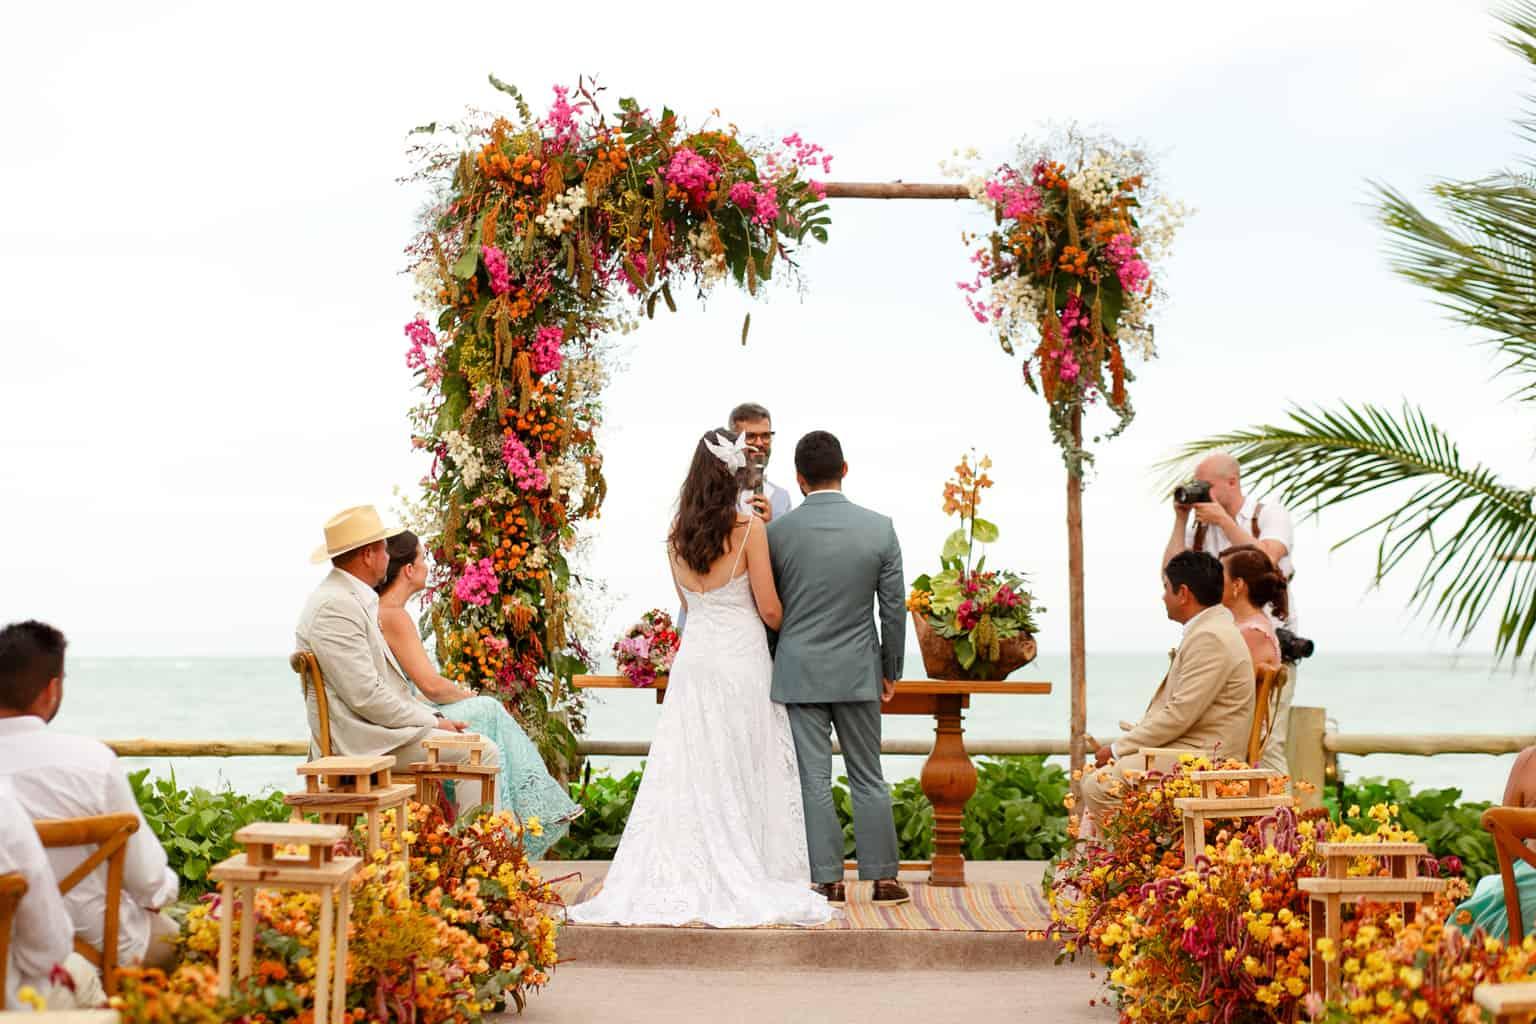 Casamento-Emanuelle-e-Alysson-Fotografia-Tadeu-Nanó-e-Luca-Antunes90-1